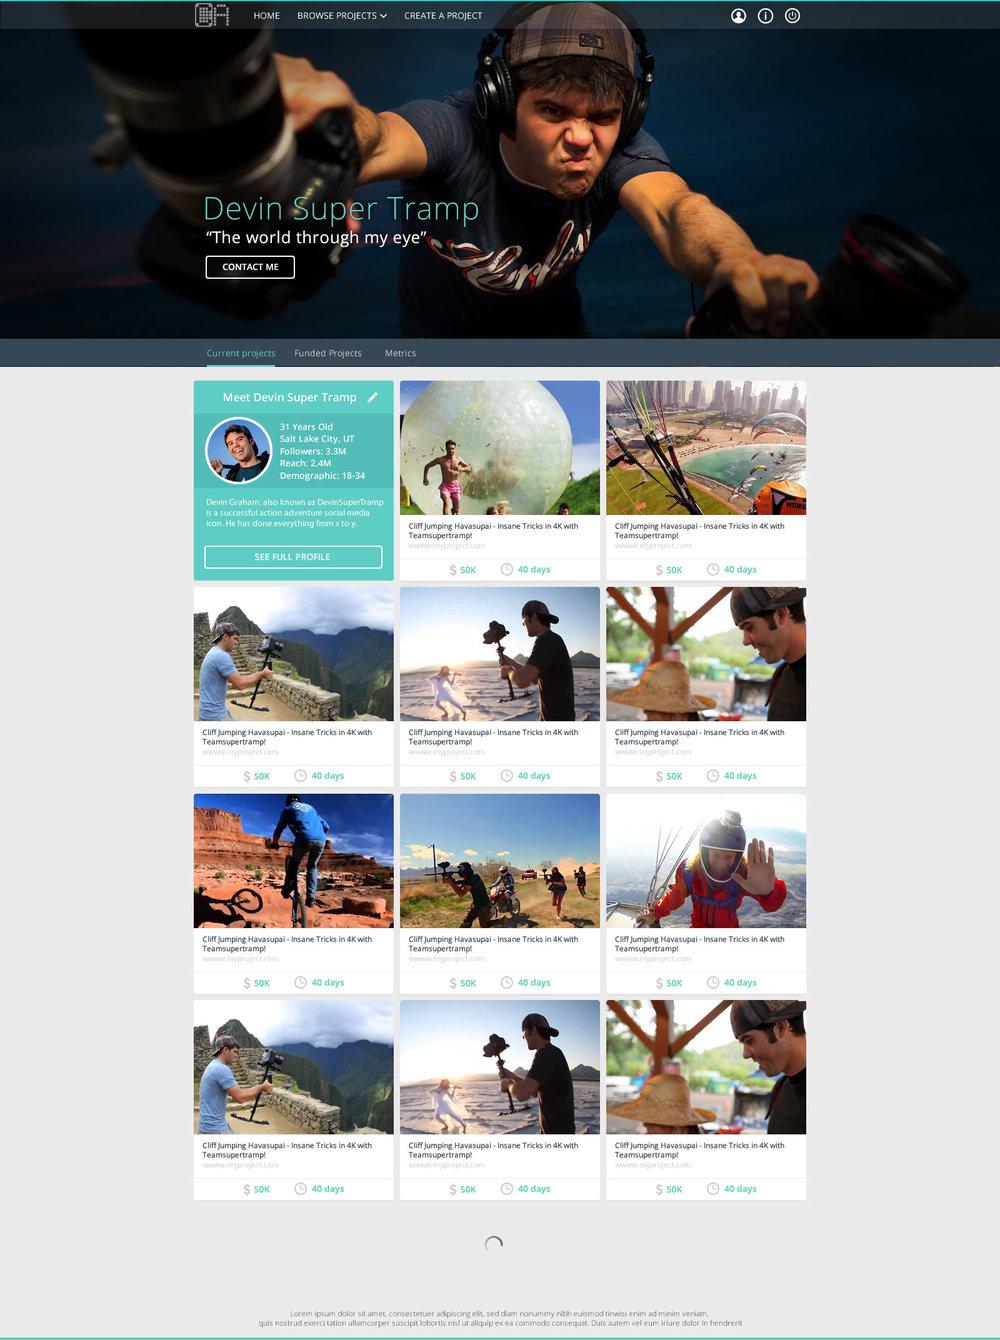 ProfilePage-creator.jpg